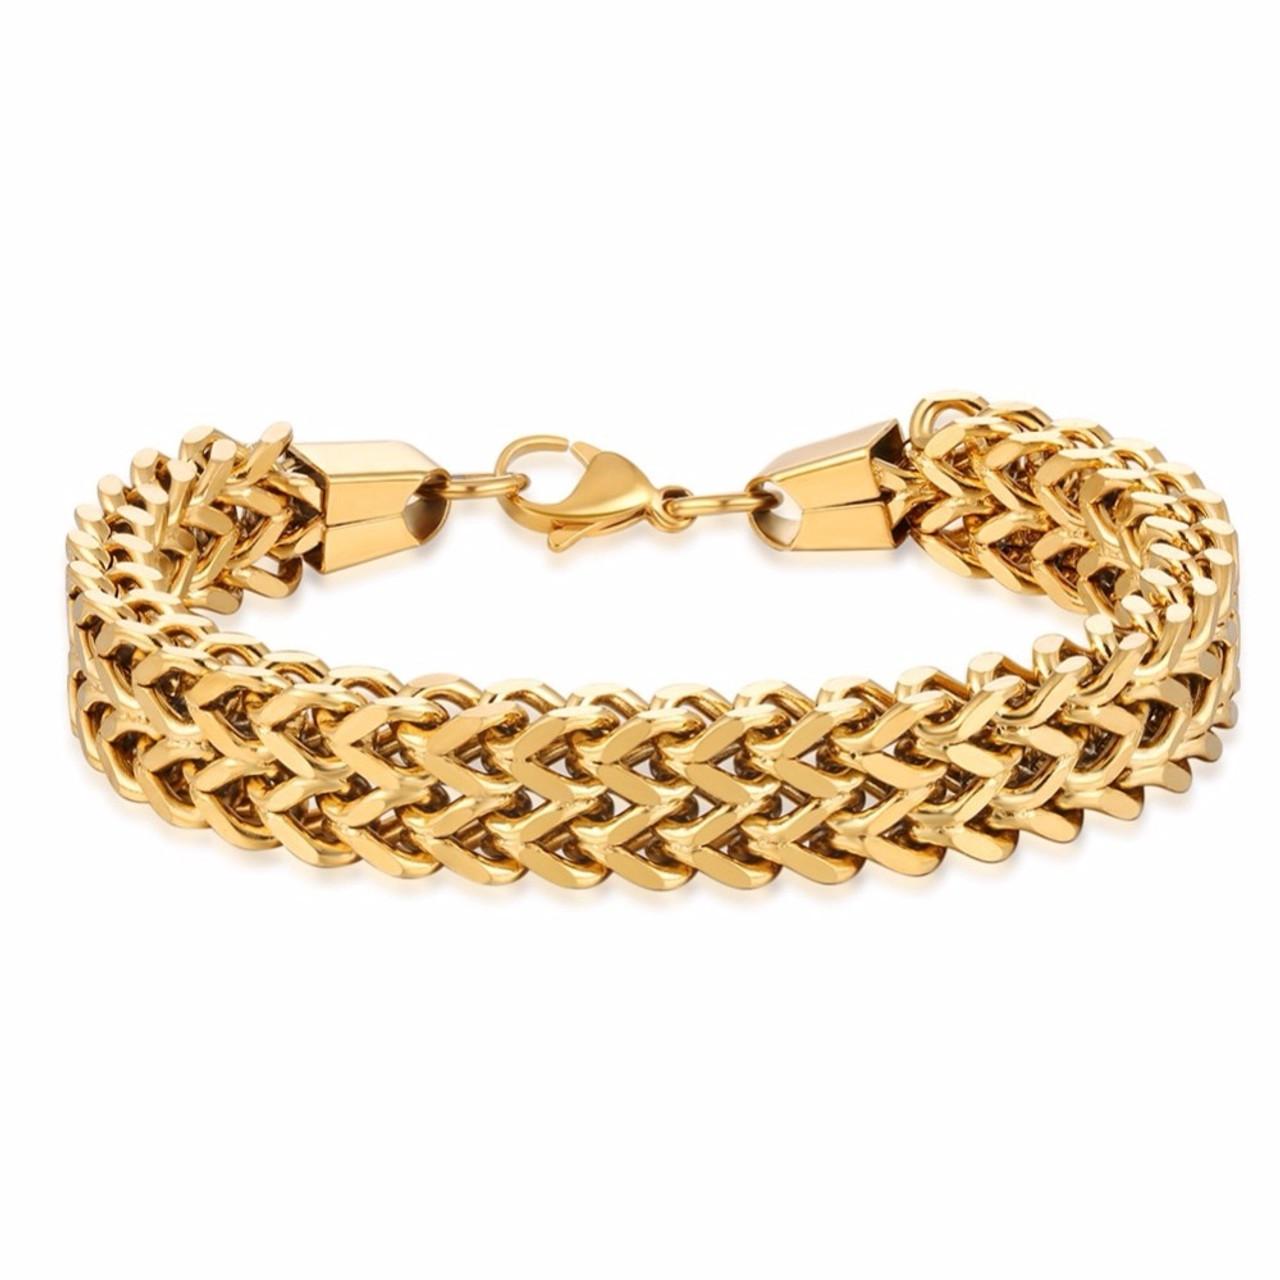 30b6438d0449a 316L Stainless Steel Bracelet Men Luxury Mens Charms Bracelets Vintage  Fashion Jewelry Chain Cuban Link Bracelet Male pulseira